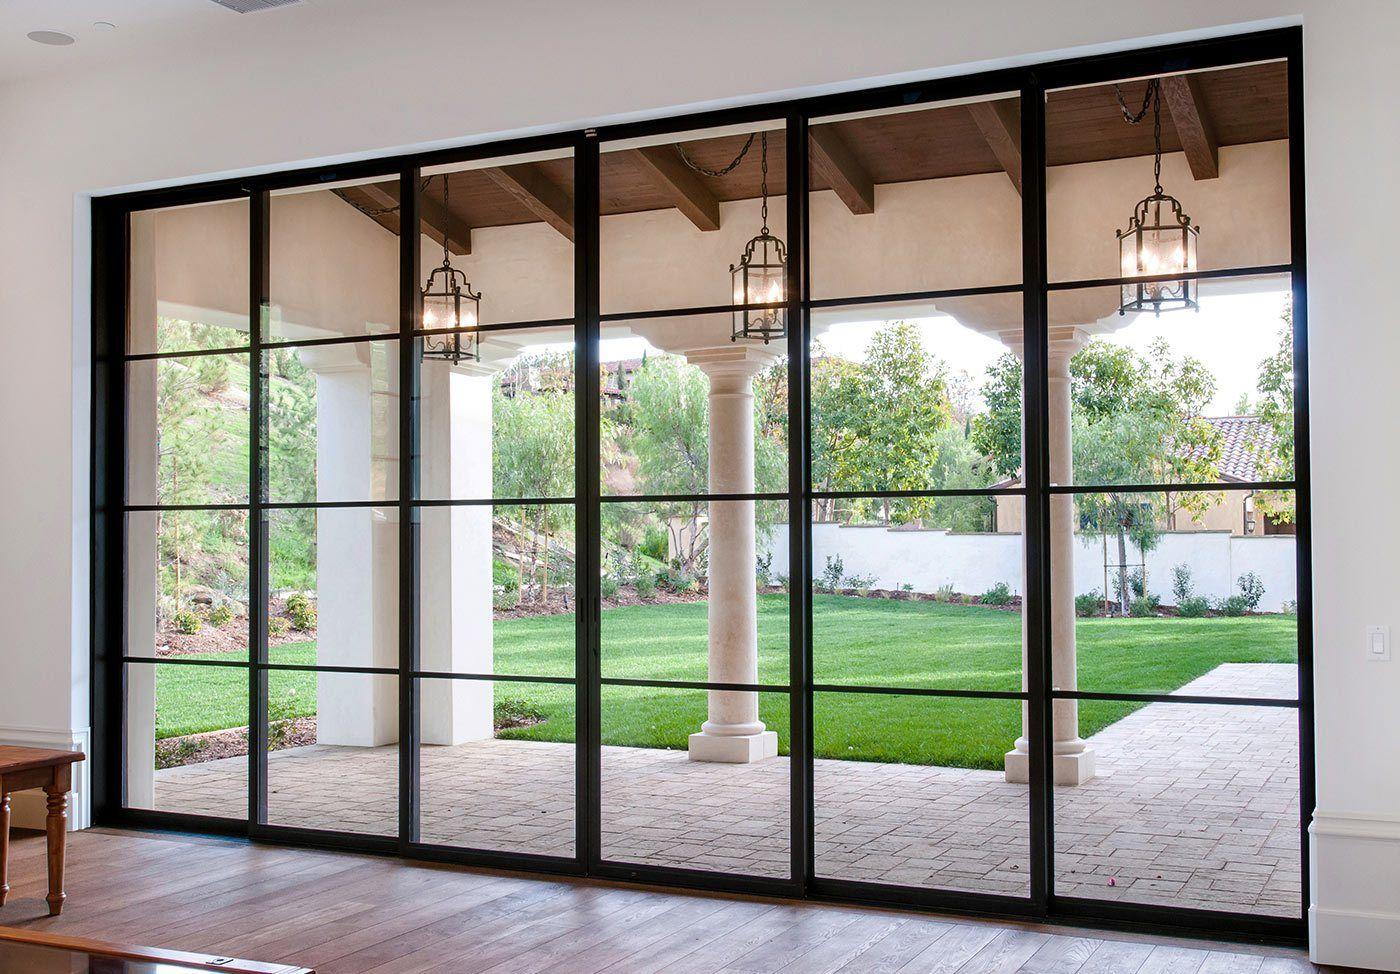 Steel Windows And Doors What I Ve Learned Sliding Doors Interior Sliding Doors Exterior Modern Patio Doors